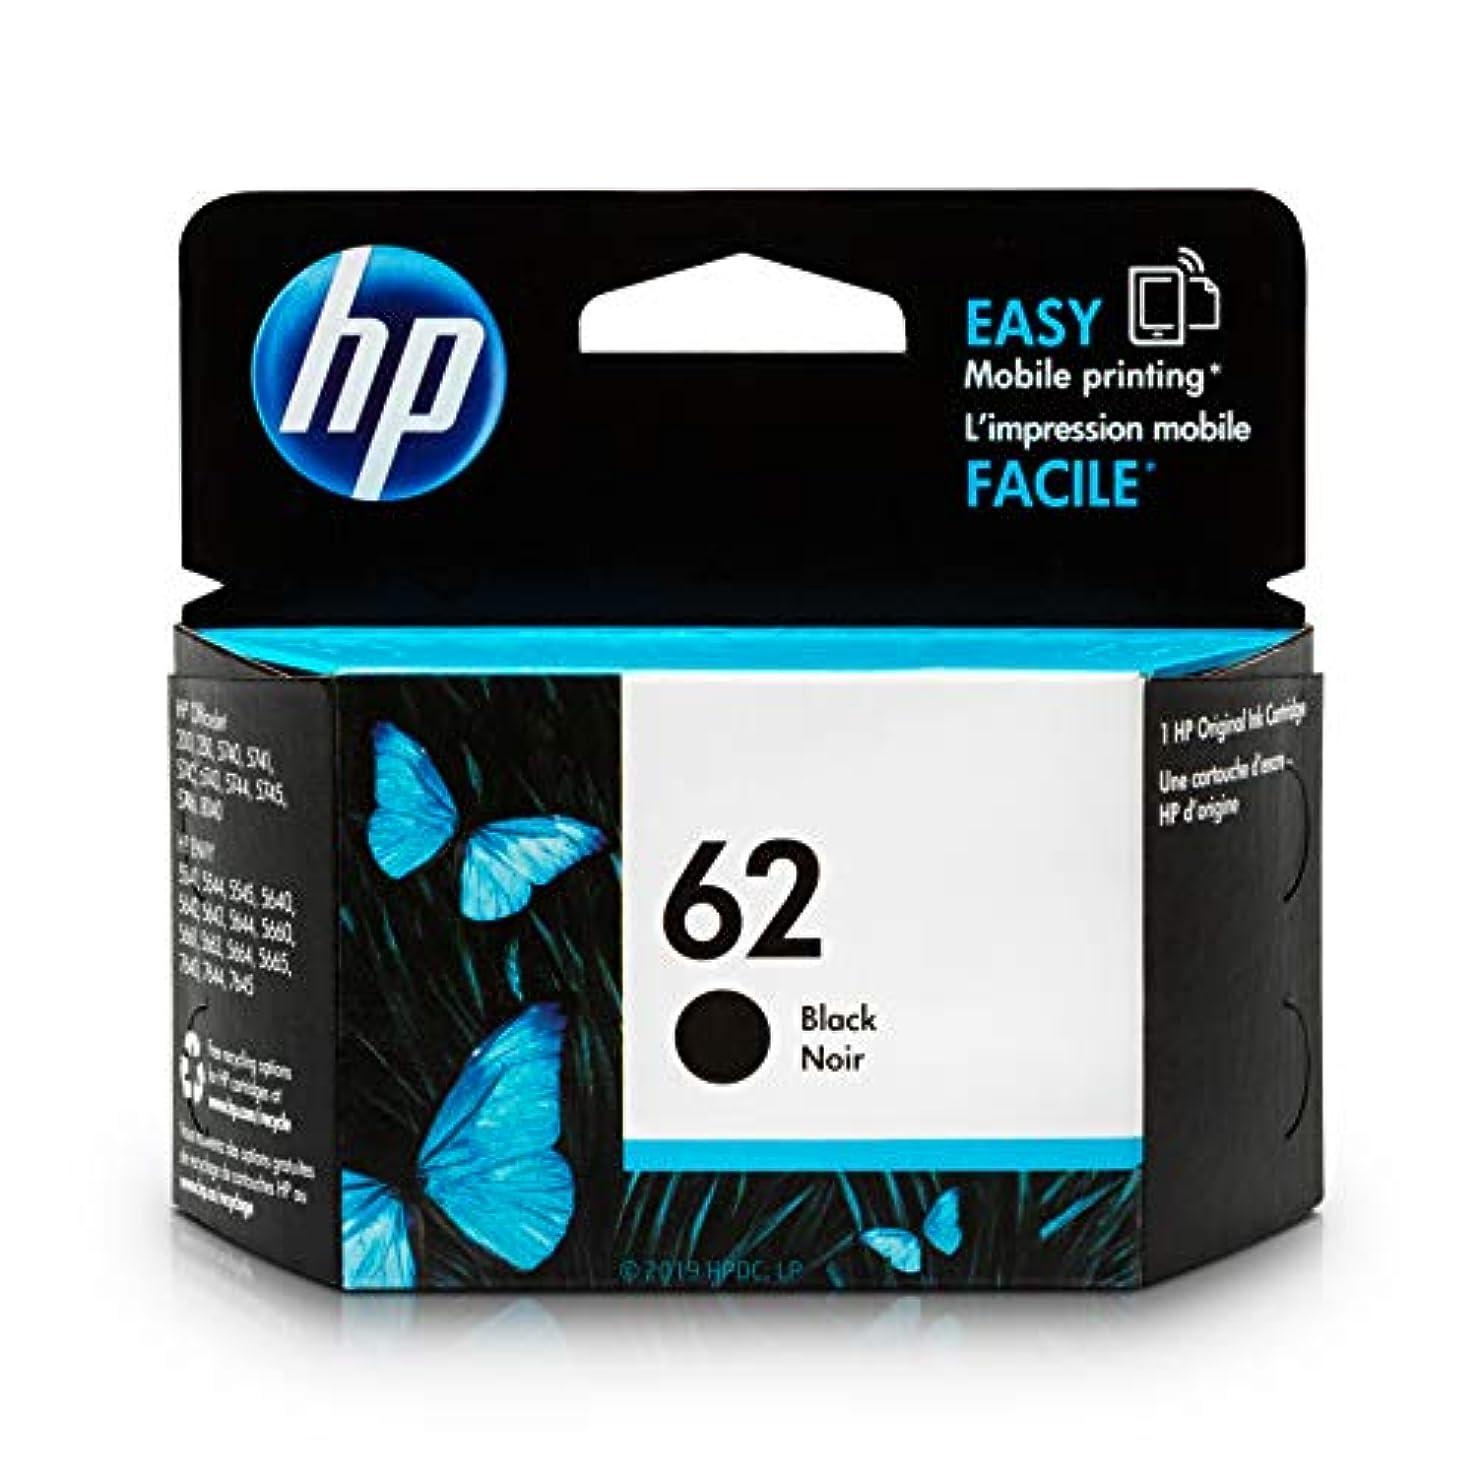 HP 62 Black Ink Cartridge (C2P04AN) for HP ENVY 5540 5541 5542 5543 5544 5545 5547 5548 5549 5640 5642 5643 5644 5660 5661 5663 5664 5665 7640 7643 7644 7645 HP Officejet 200 250 258 5740 5741 5742